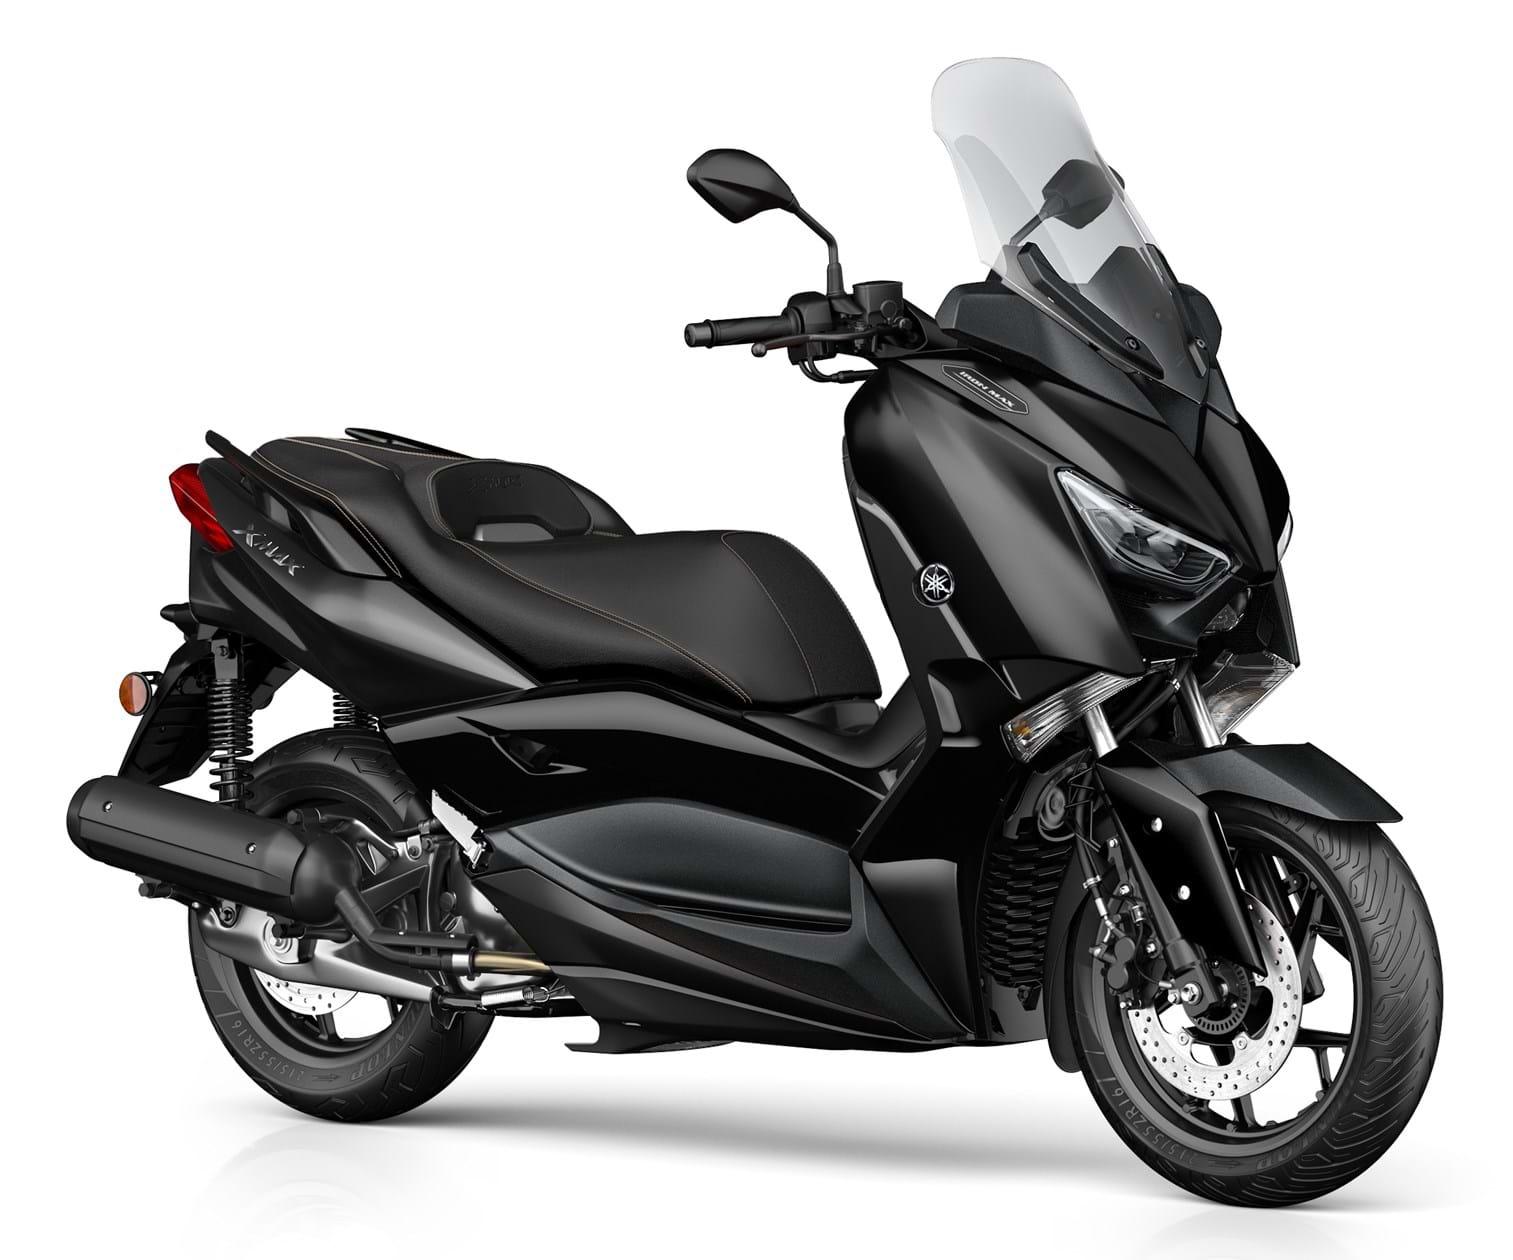 For Sale: Yamaha X-MAX 125 • The Bike Market